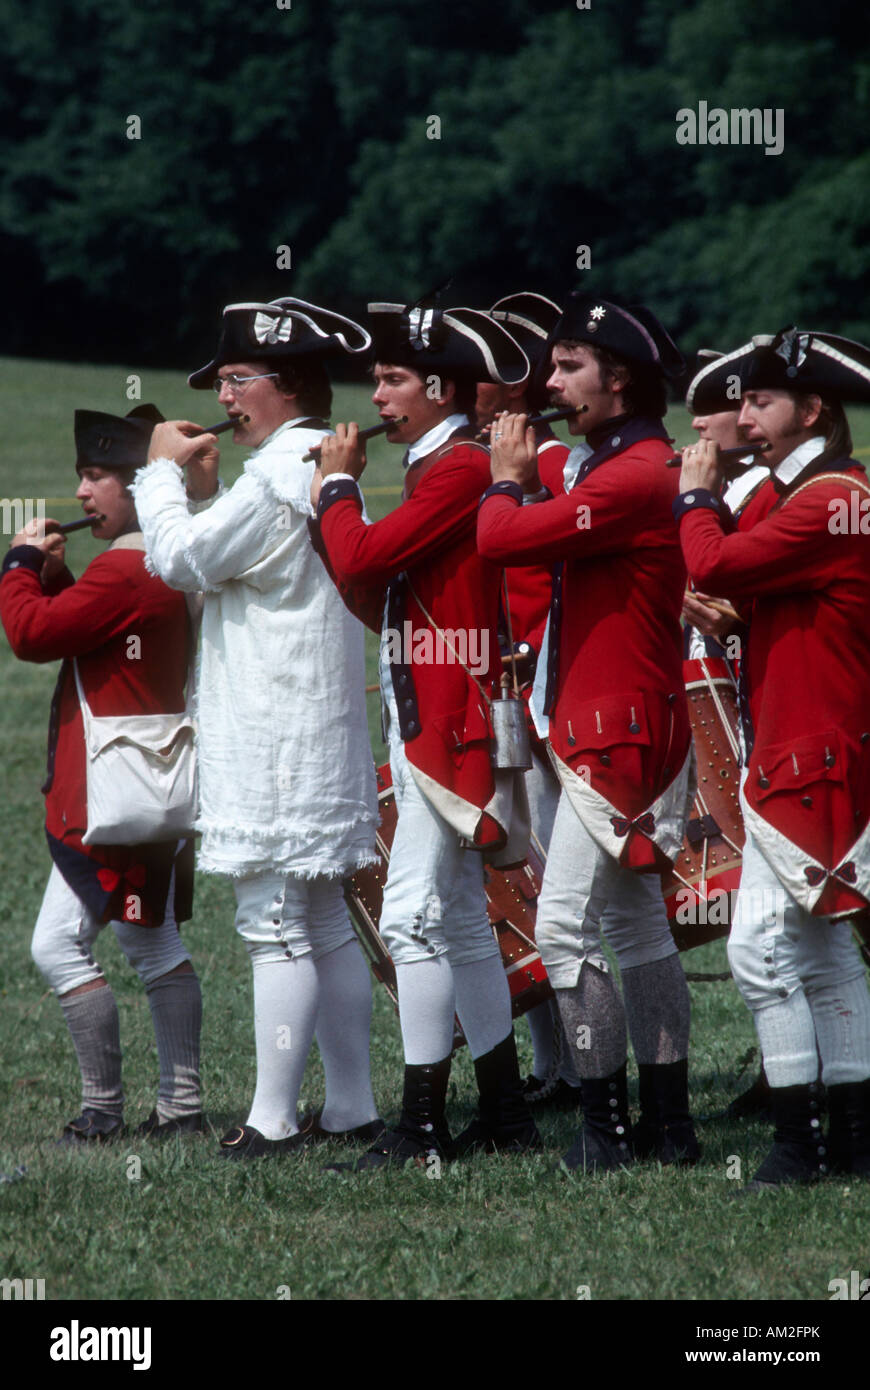 A revolutionary War re-enactment Stock Photo: 15127098 - Alamy